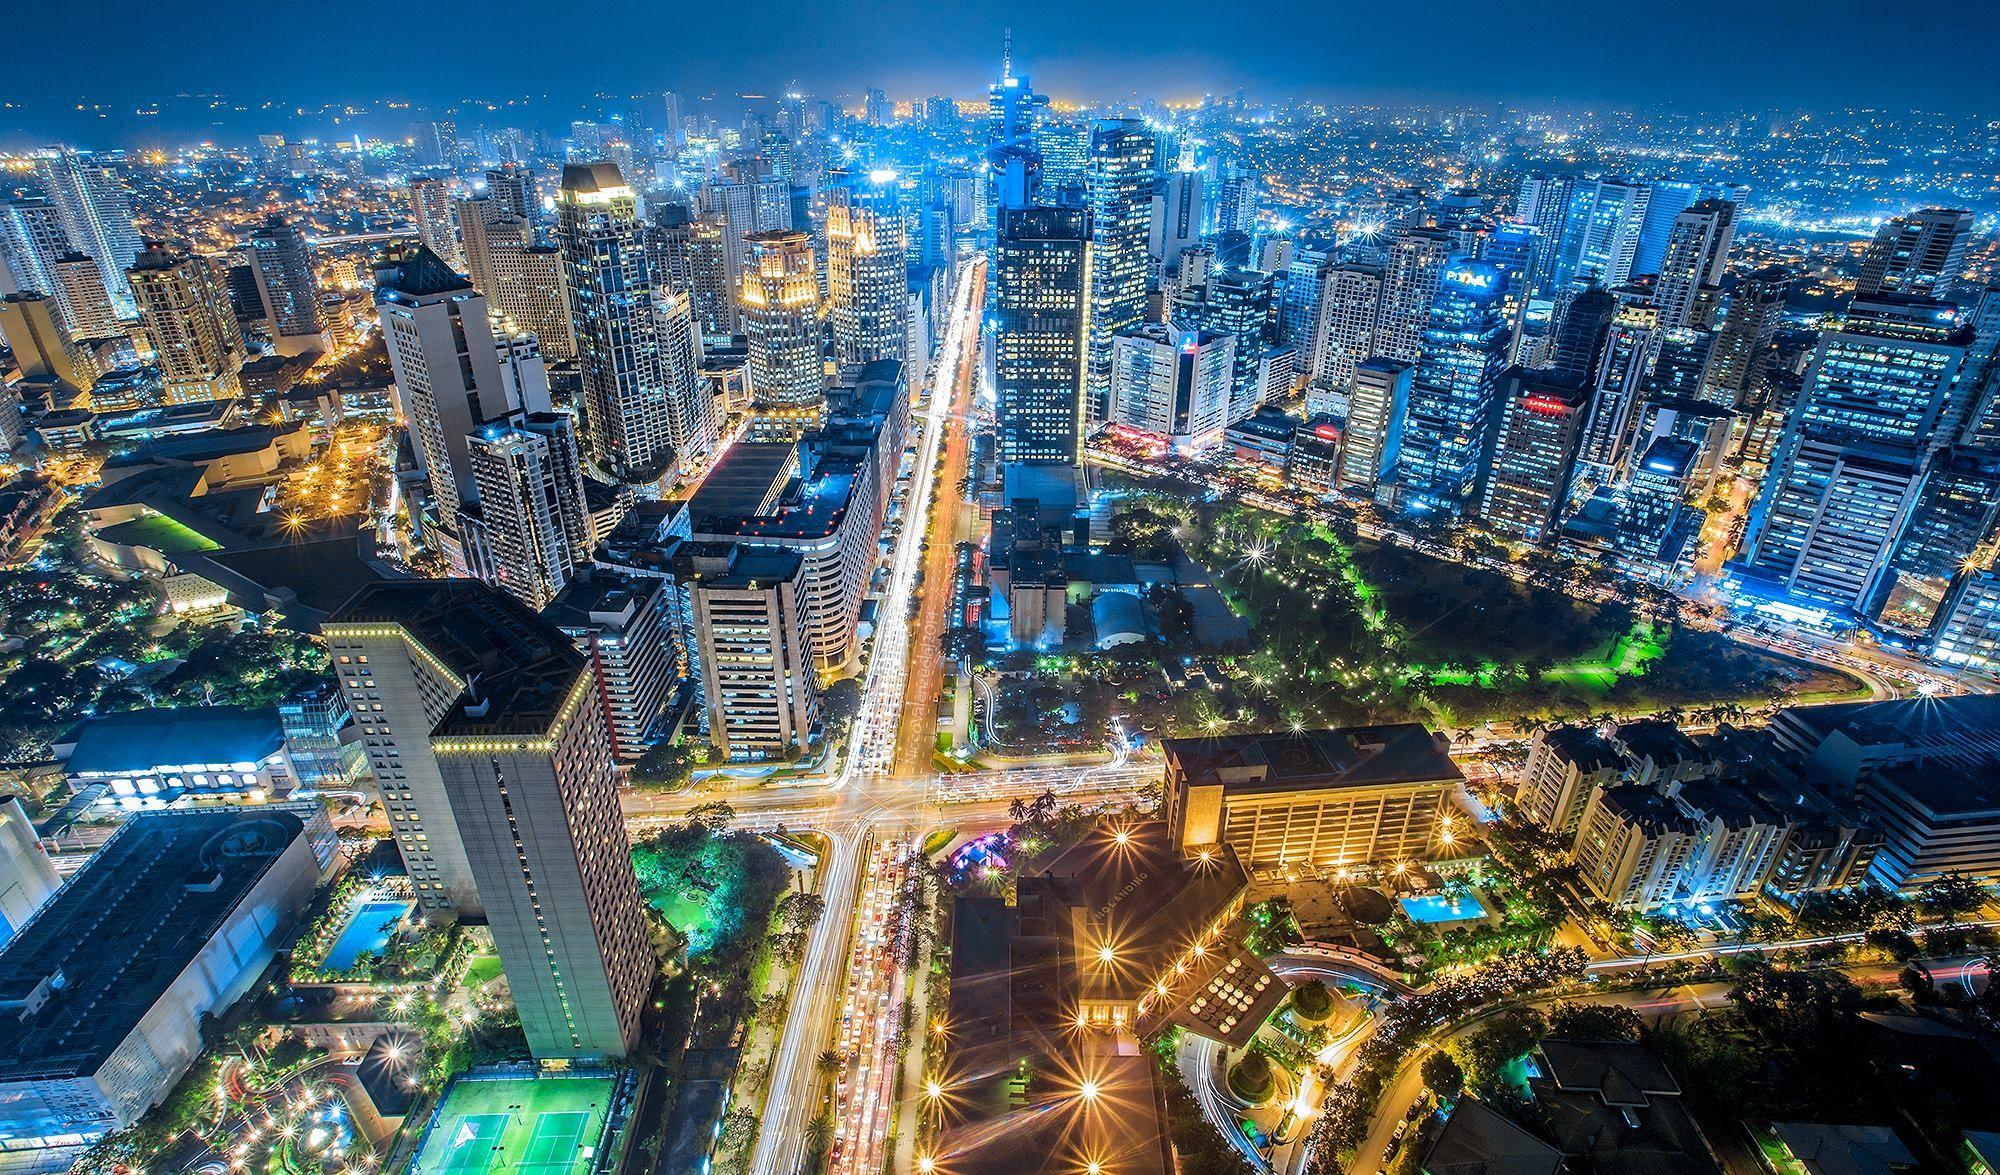 Metro Manila - Philippines - Page 312 - SkyscraperCity